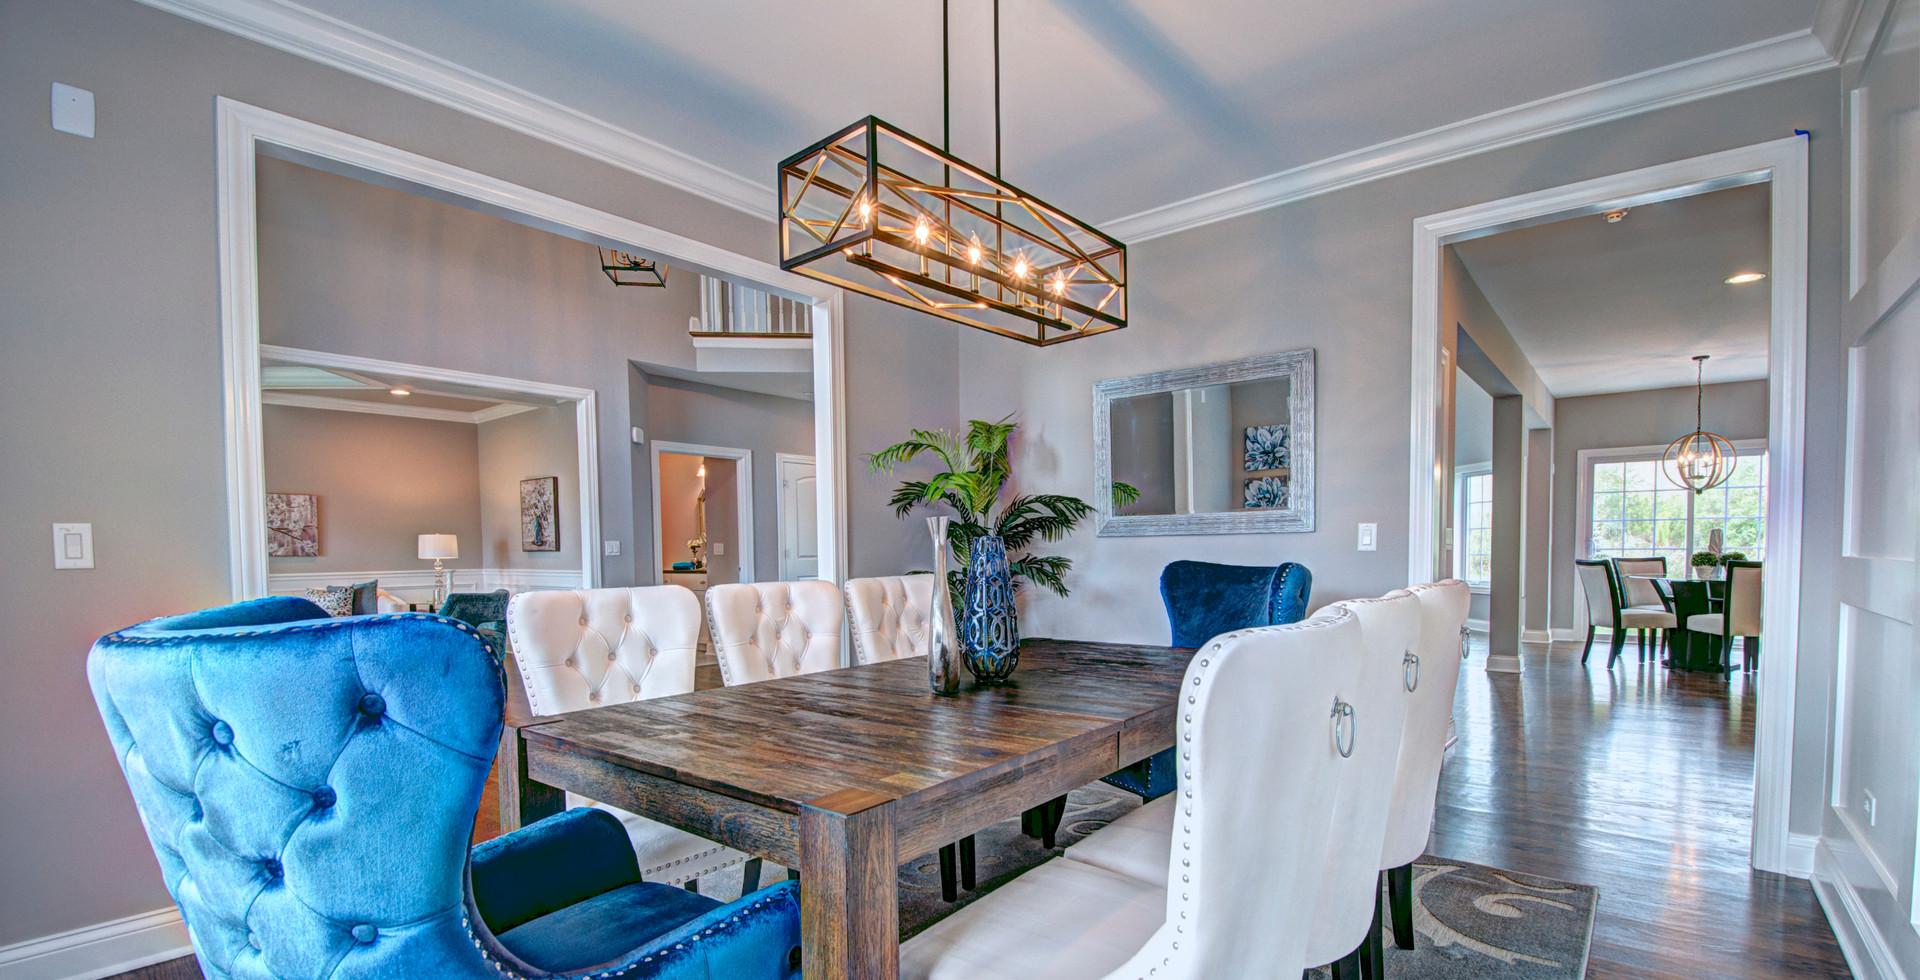 Dining Room in Naperville designed by MRM Home Design.jpg